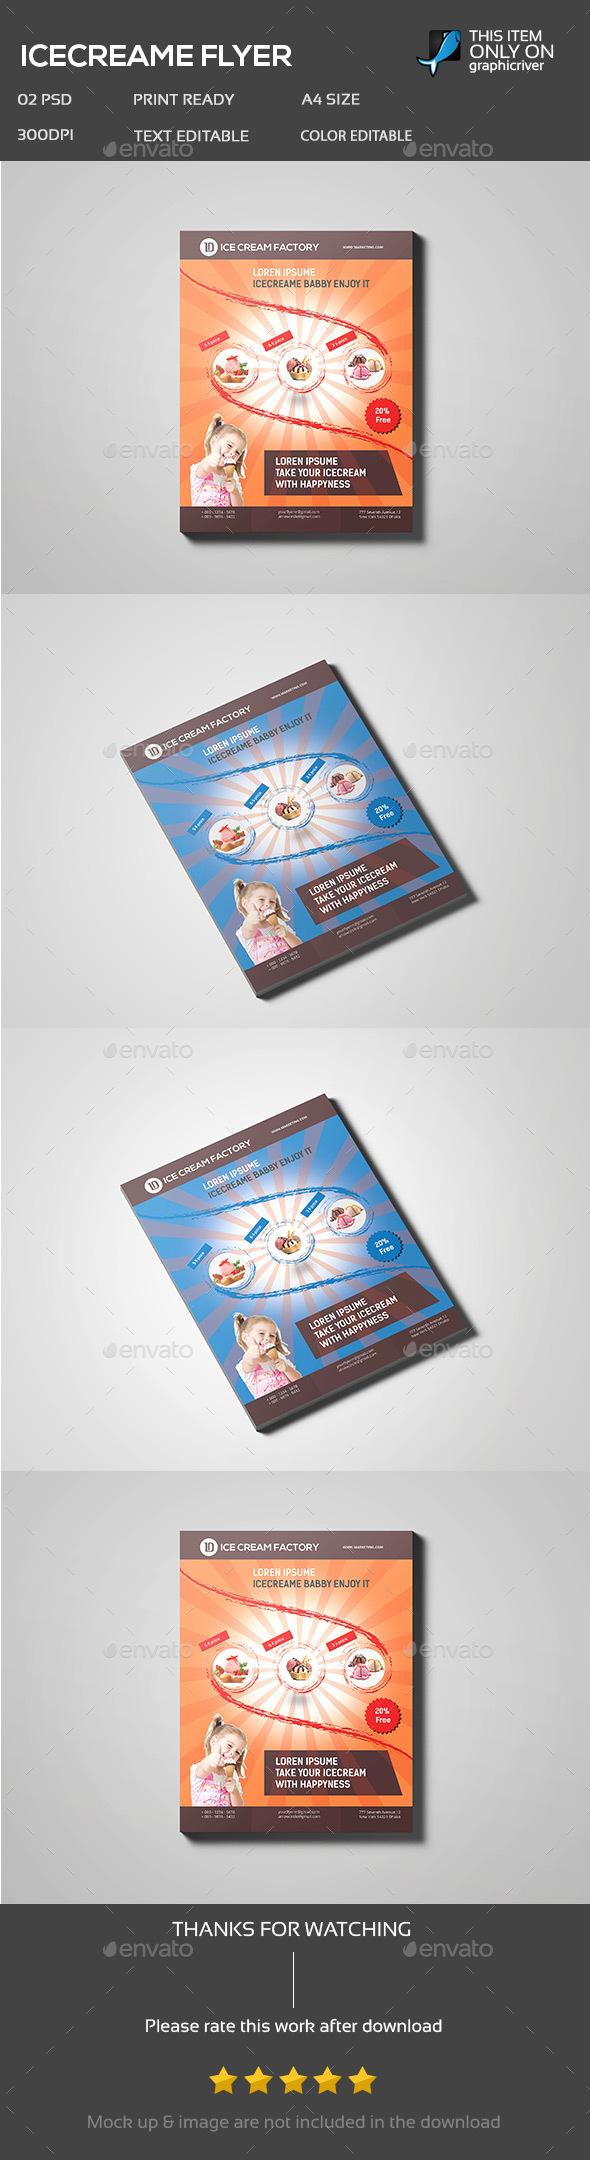 Ice Cream Flyer - Flyers Print Templates